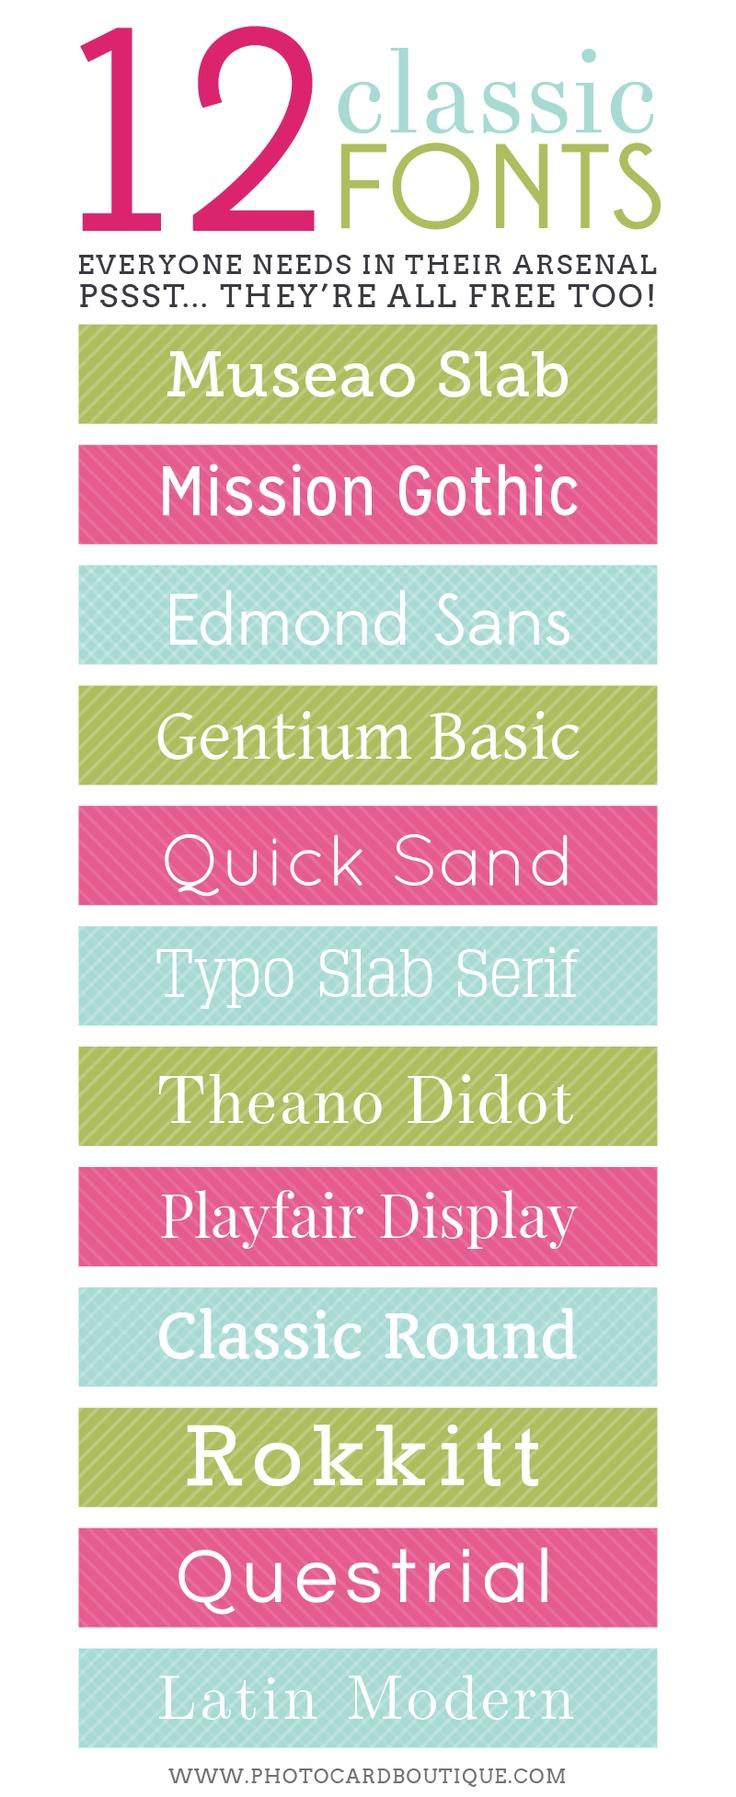 12 Classic Fonts You Need